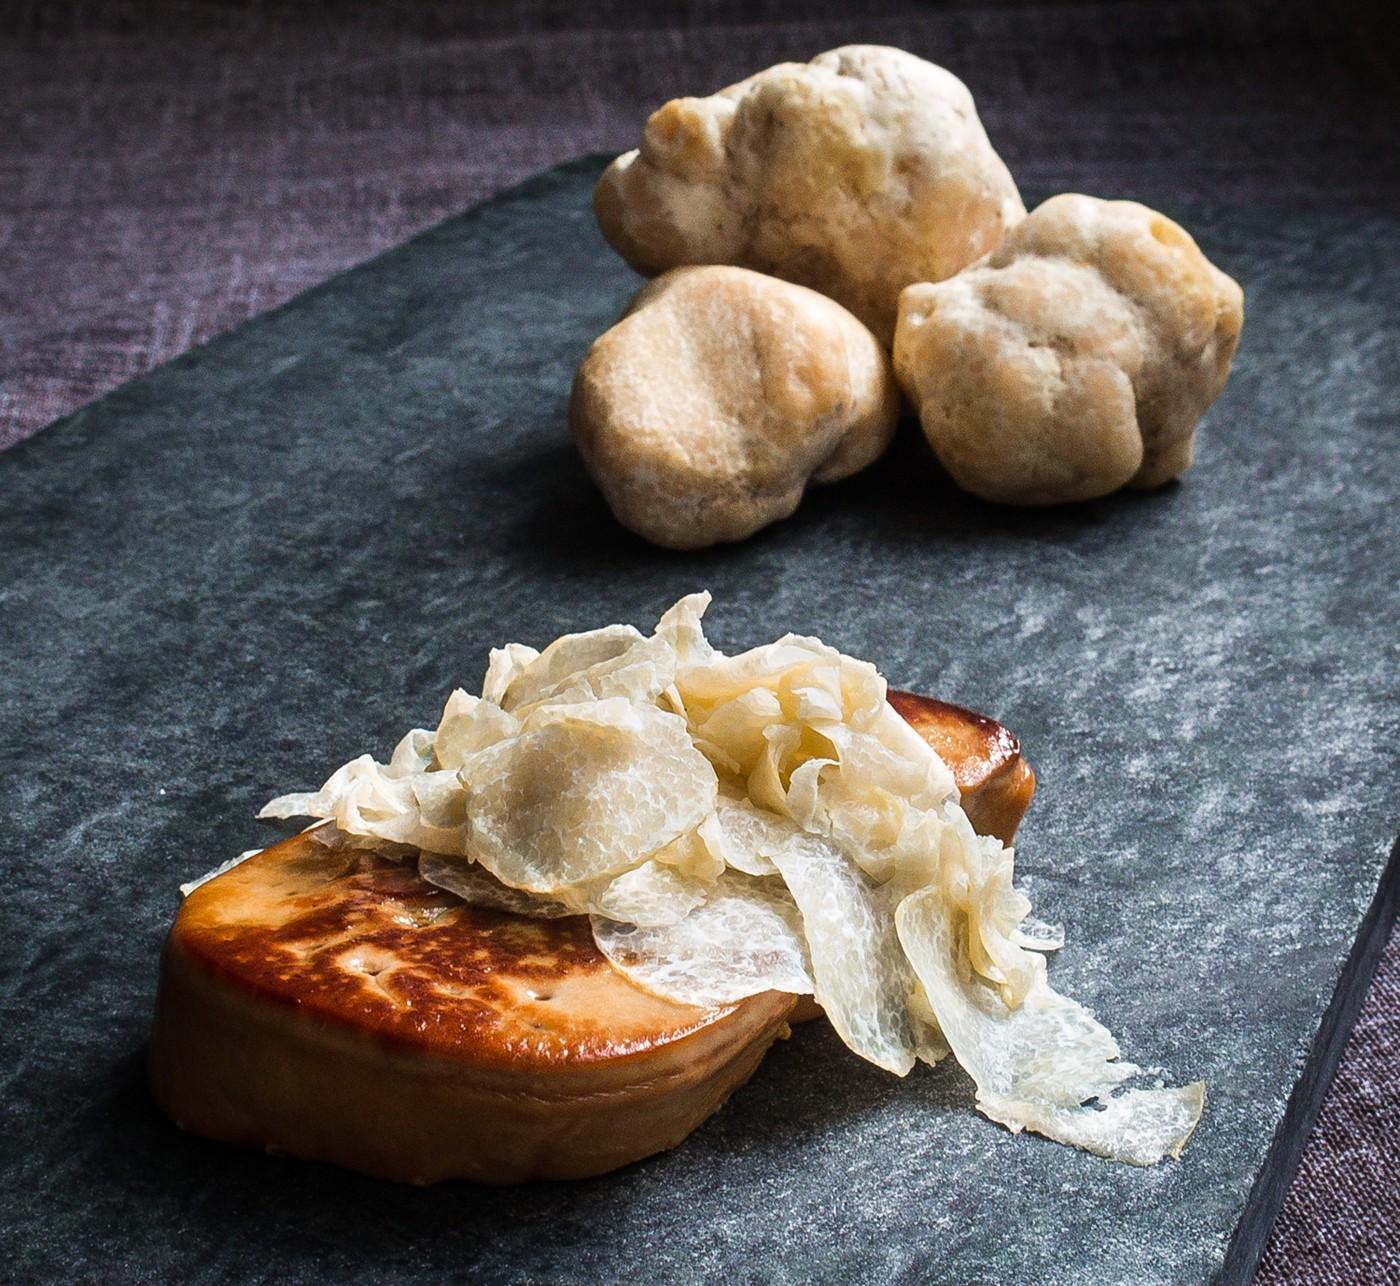 Foie fresco de pato a la plancha